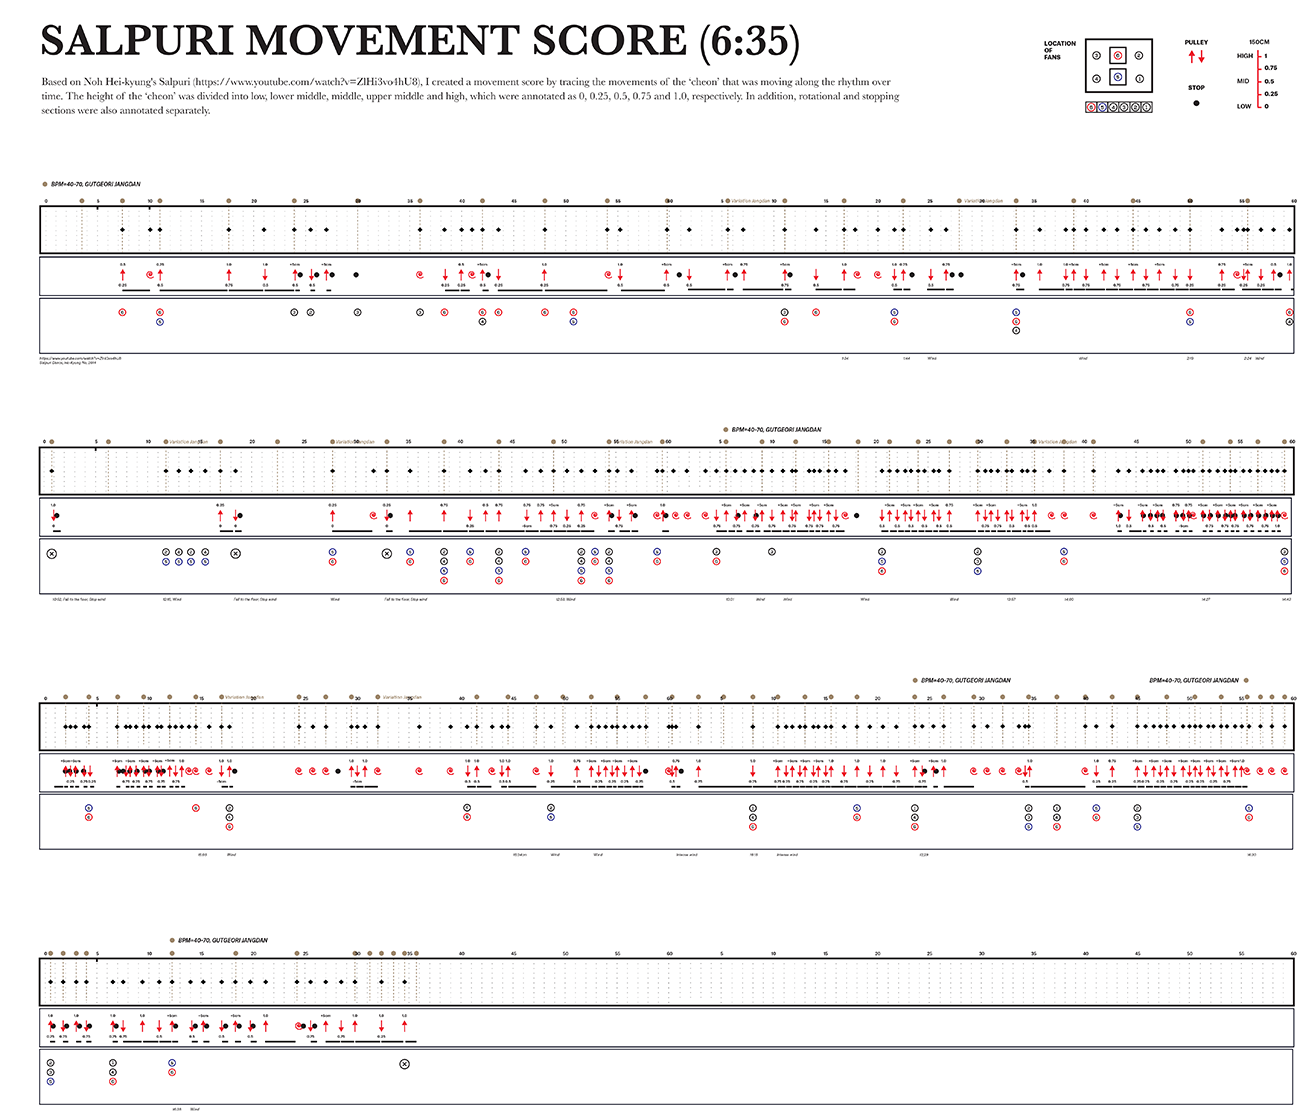 ID_SukGo_print_movement scor.png